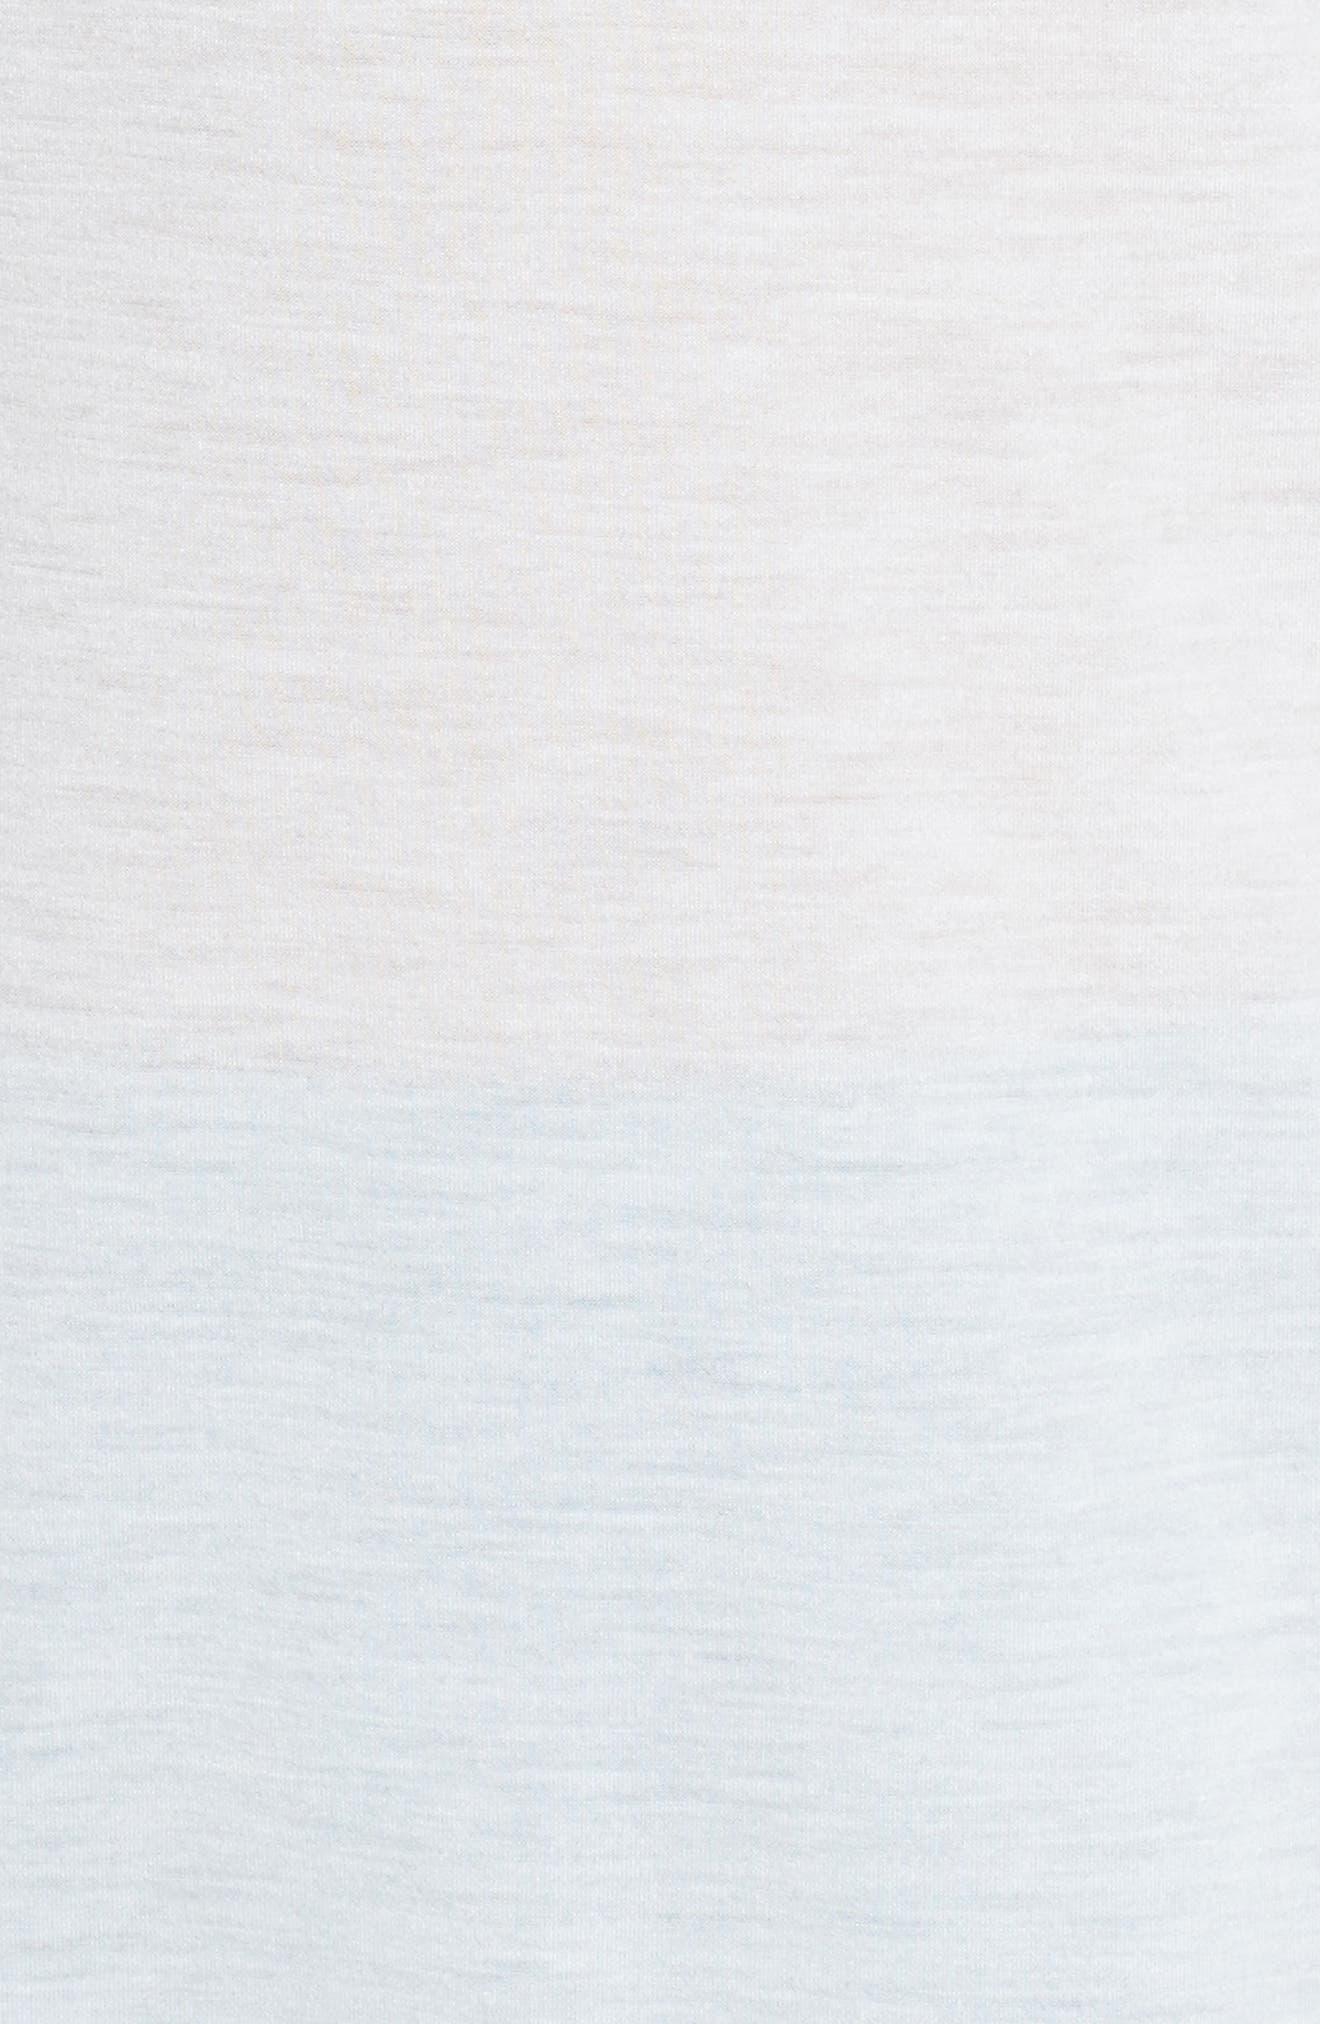 Dry Training Tank,                             Alternate thumbnail 4, color,                             Pure Platinum/ White/ White